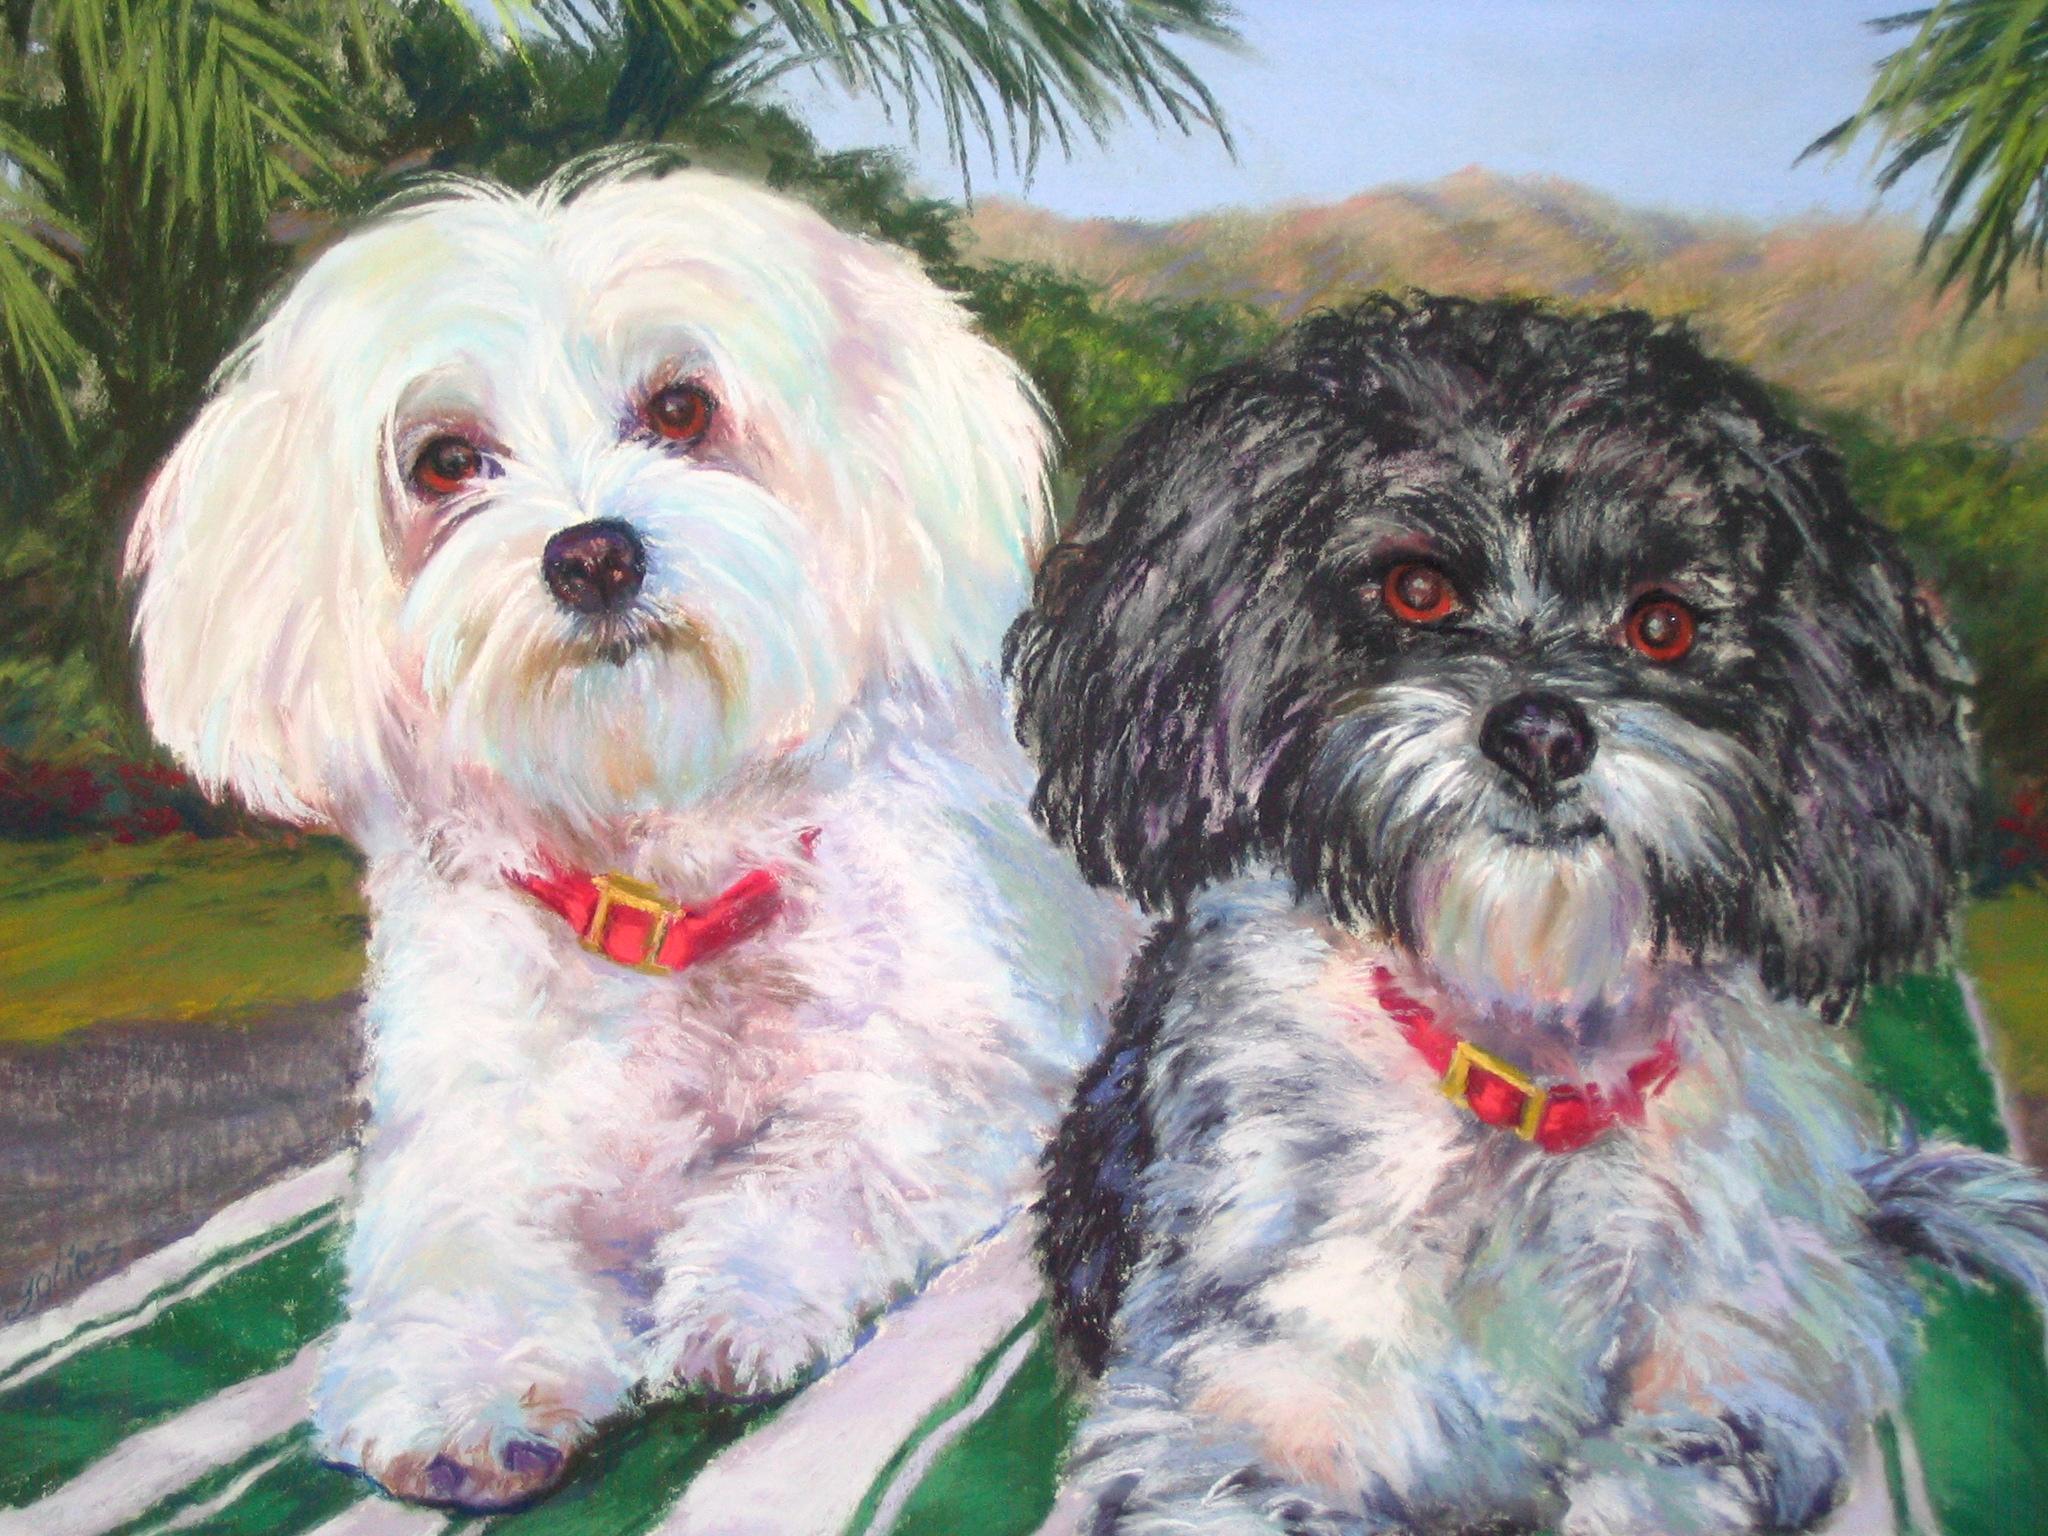 Frankie and Lila